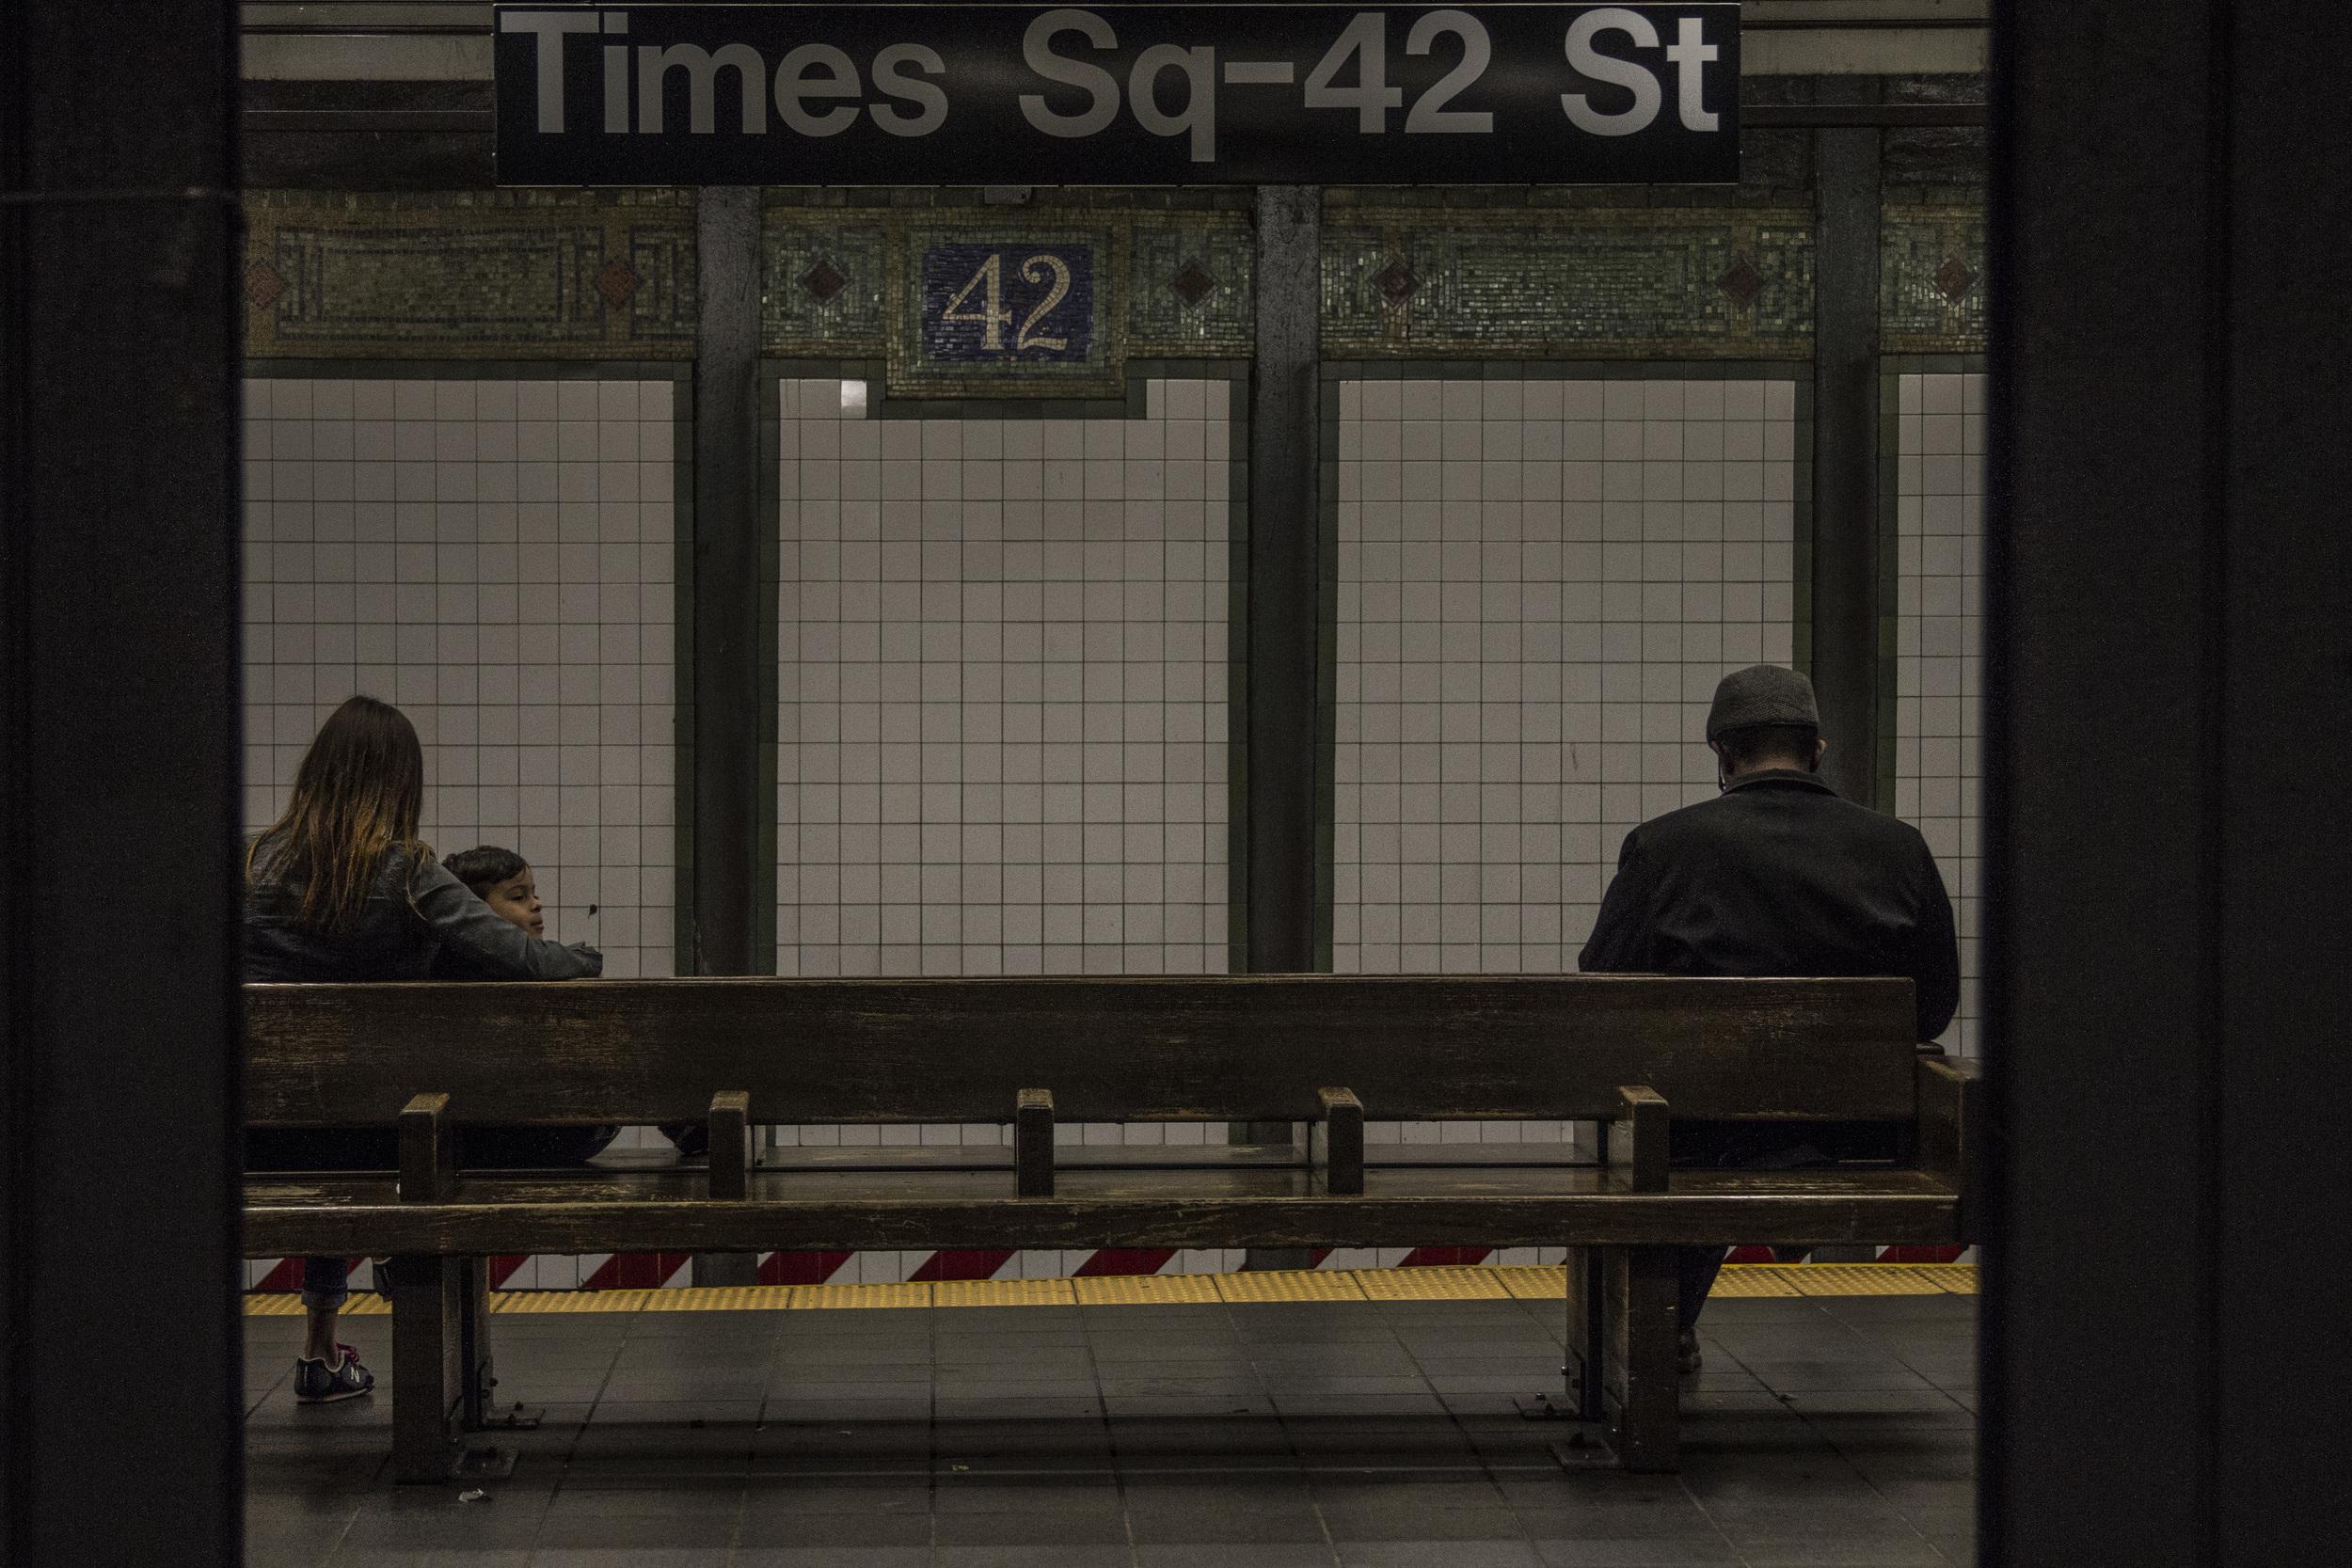 Times Square 42nd Street - N/Q/R